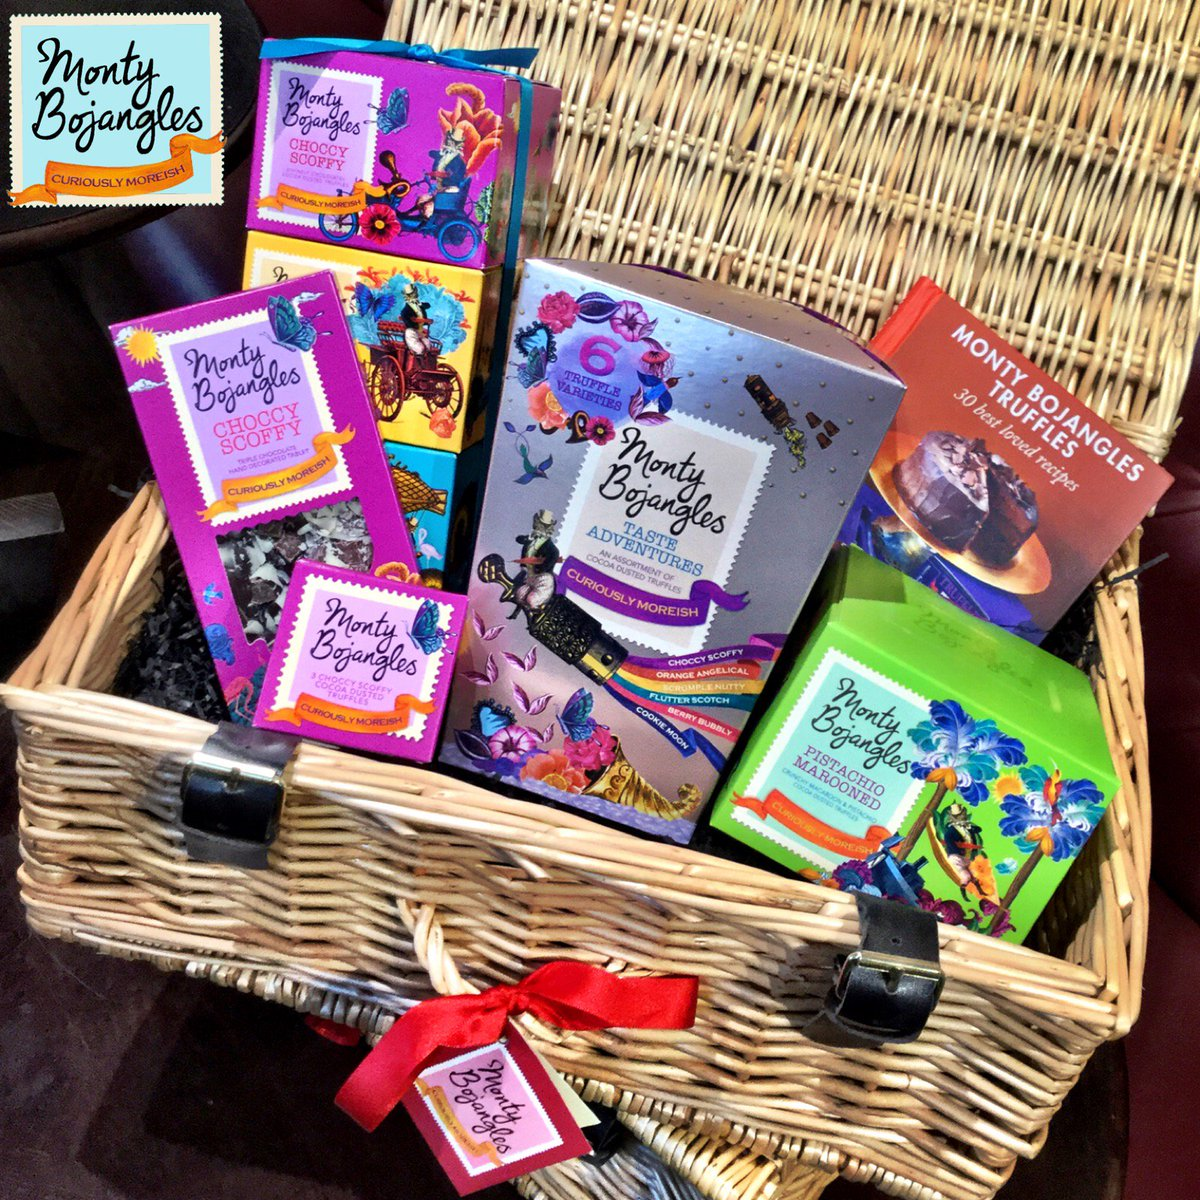 #JanuaryBlues? Let us help! RT & FOLLOW to enter. NEW #TasteAdventures Hamper #Giveaway #MontyBojangles end 13-01-16 https://t.co/33Ufbu8RvK